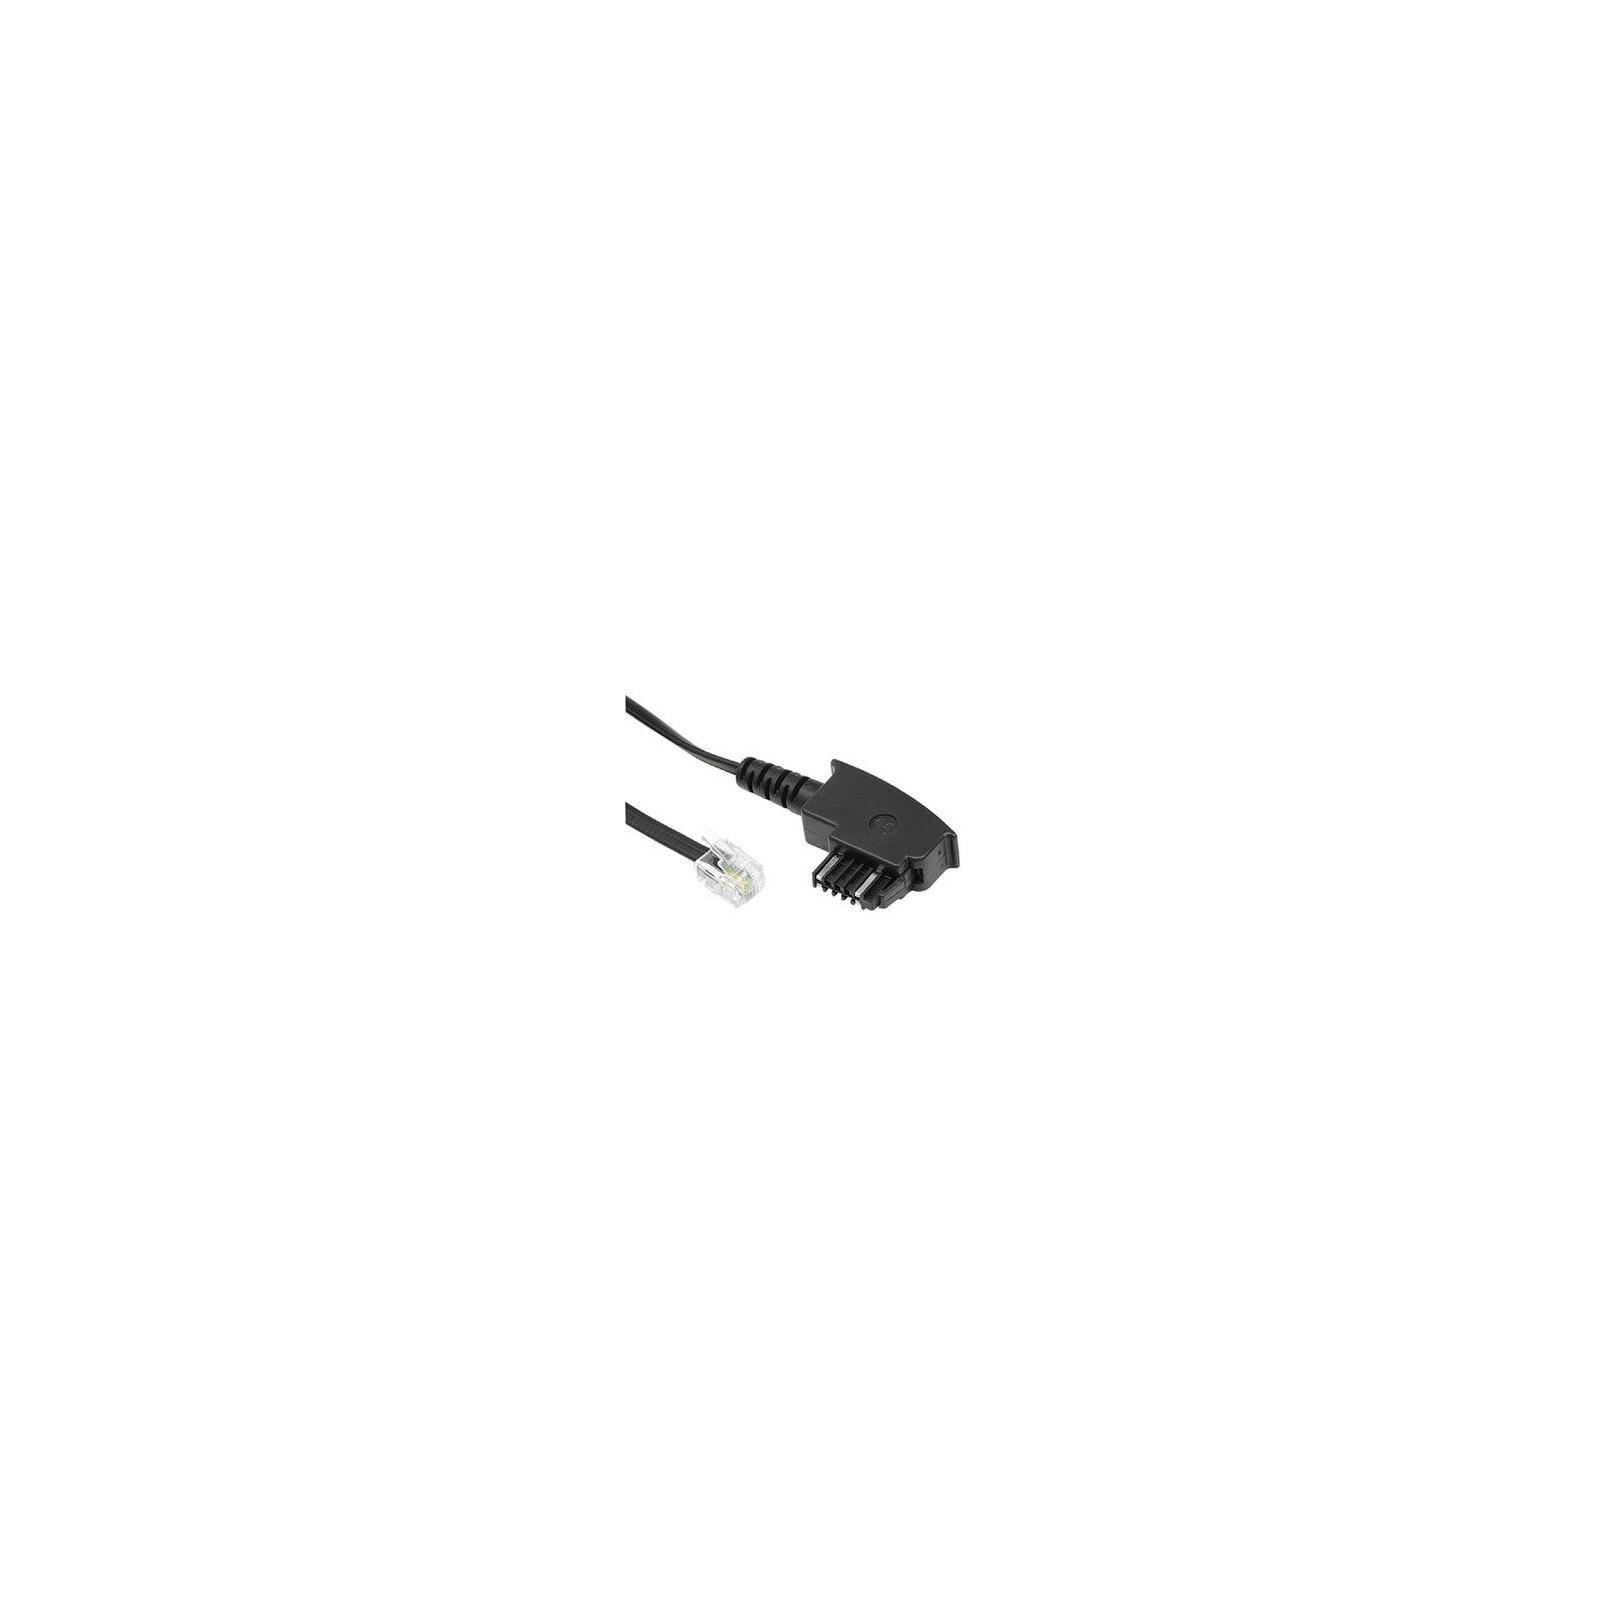 Hama 44401 TST-Stecker - Modular-St. 6p4c, 3 m